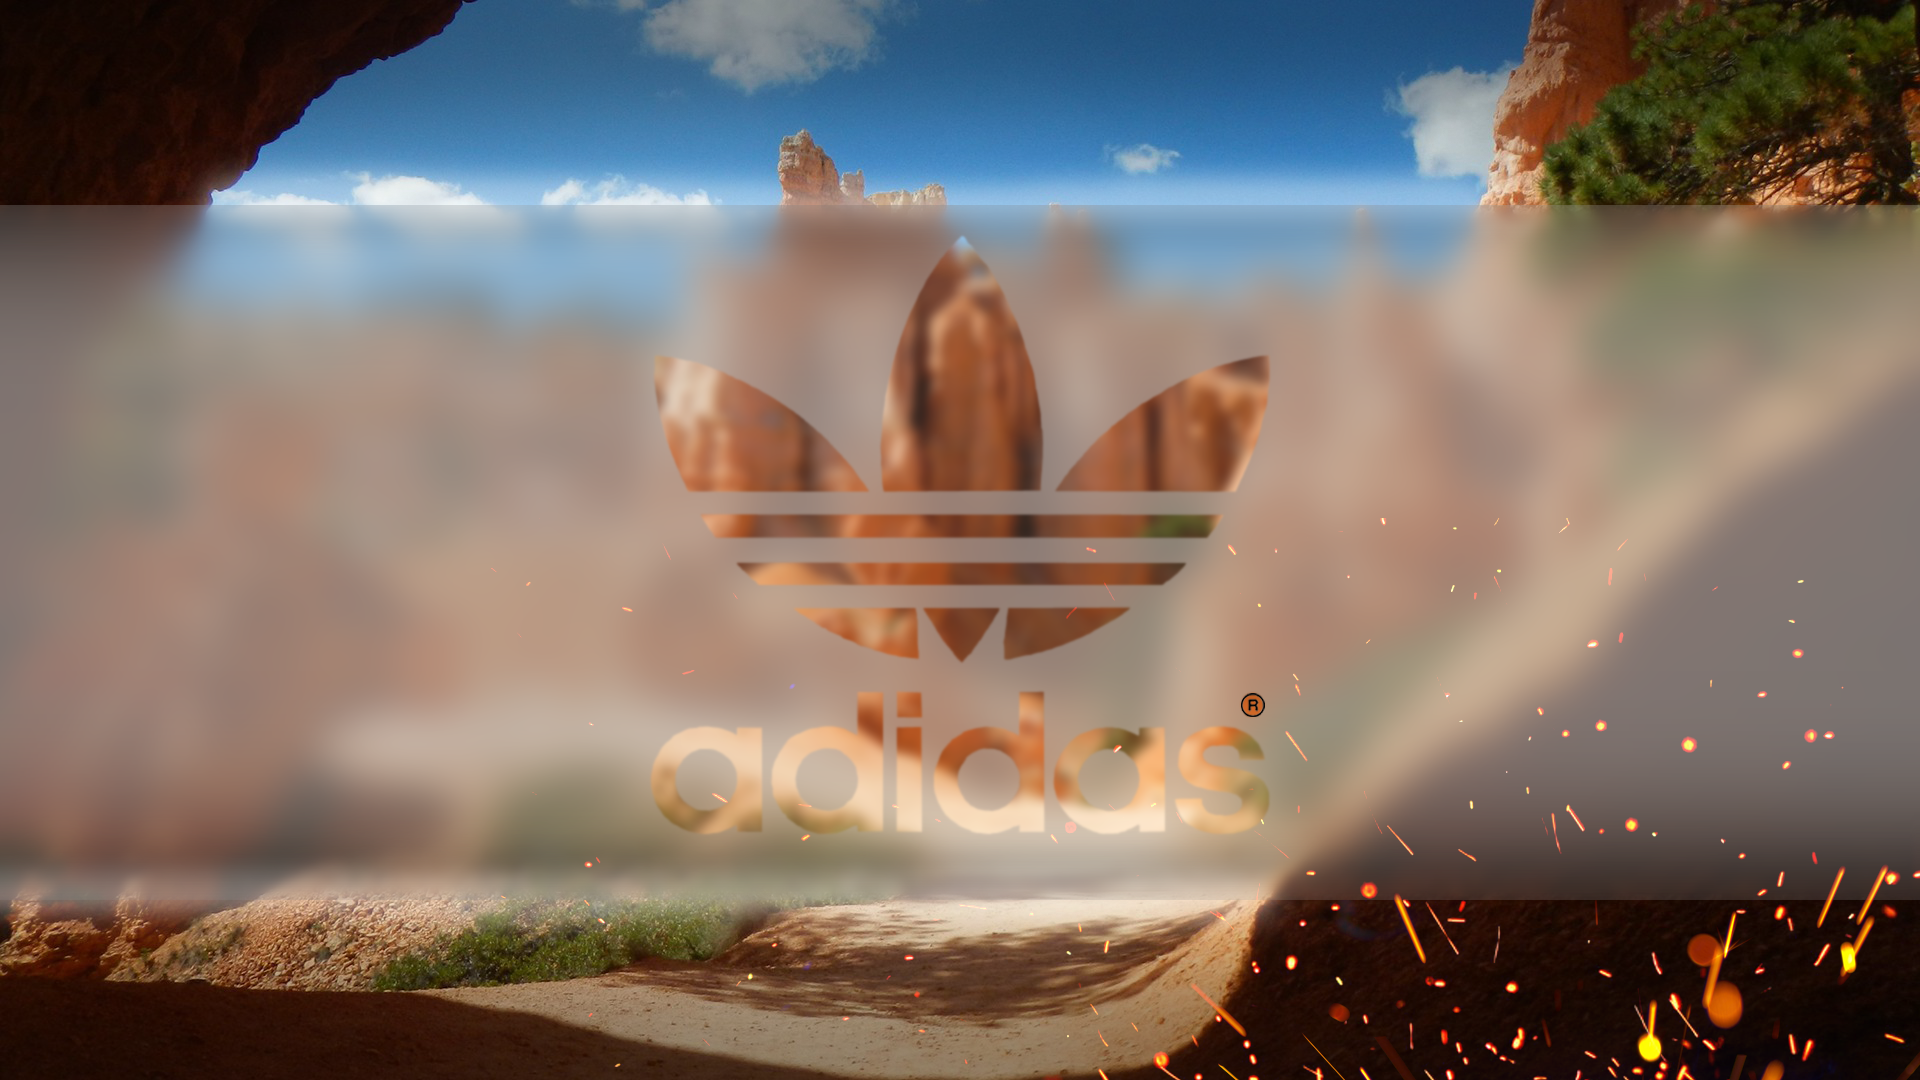 Adidas HD Wallpaper | Background Image | 1920x1080 | ID ...